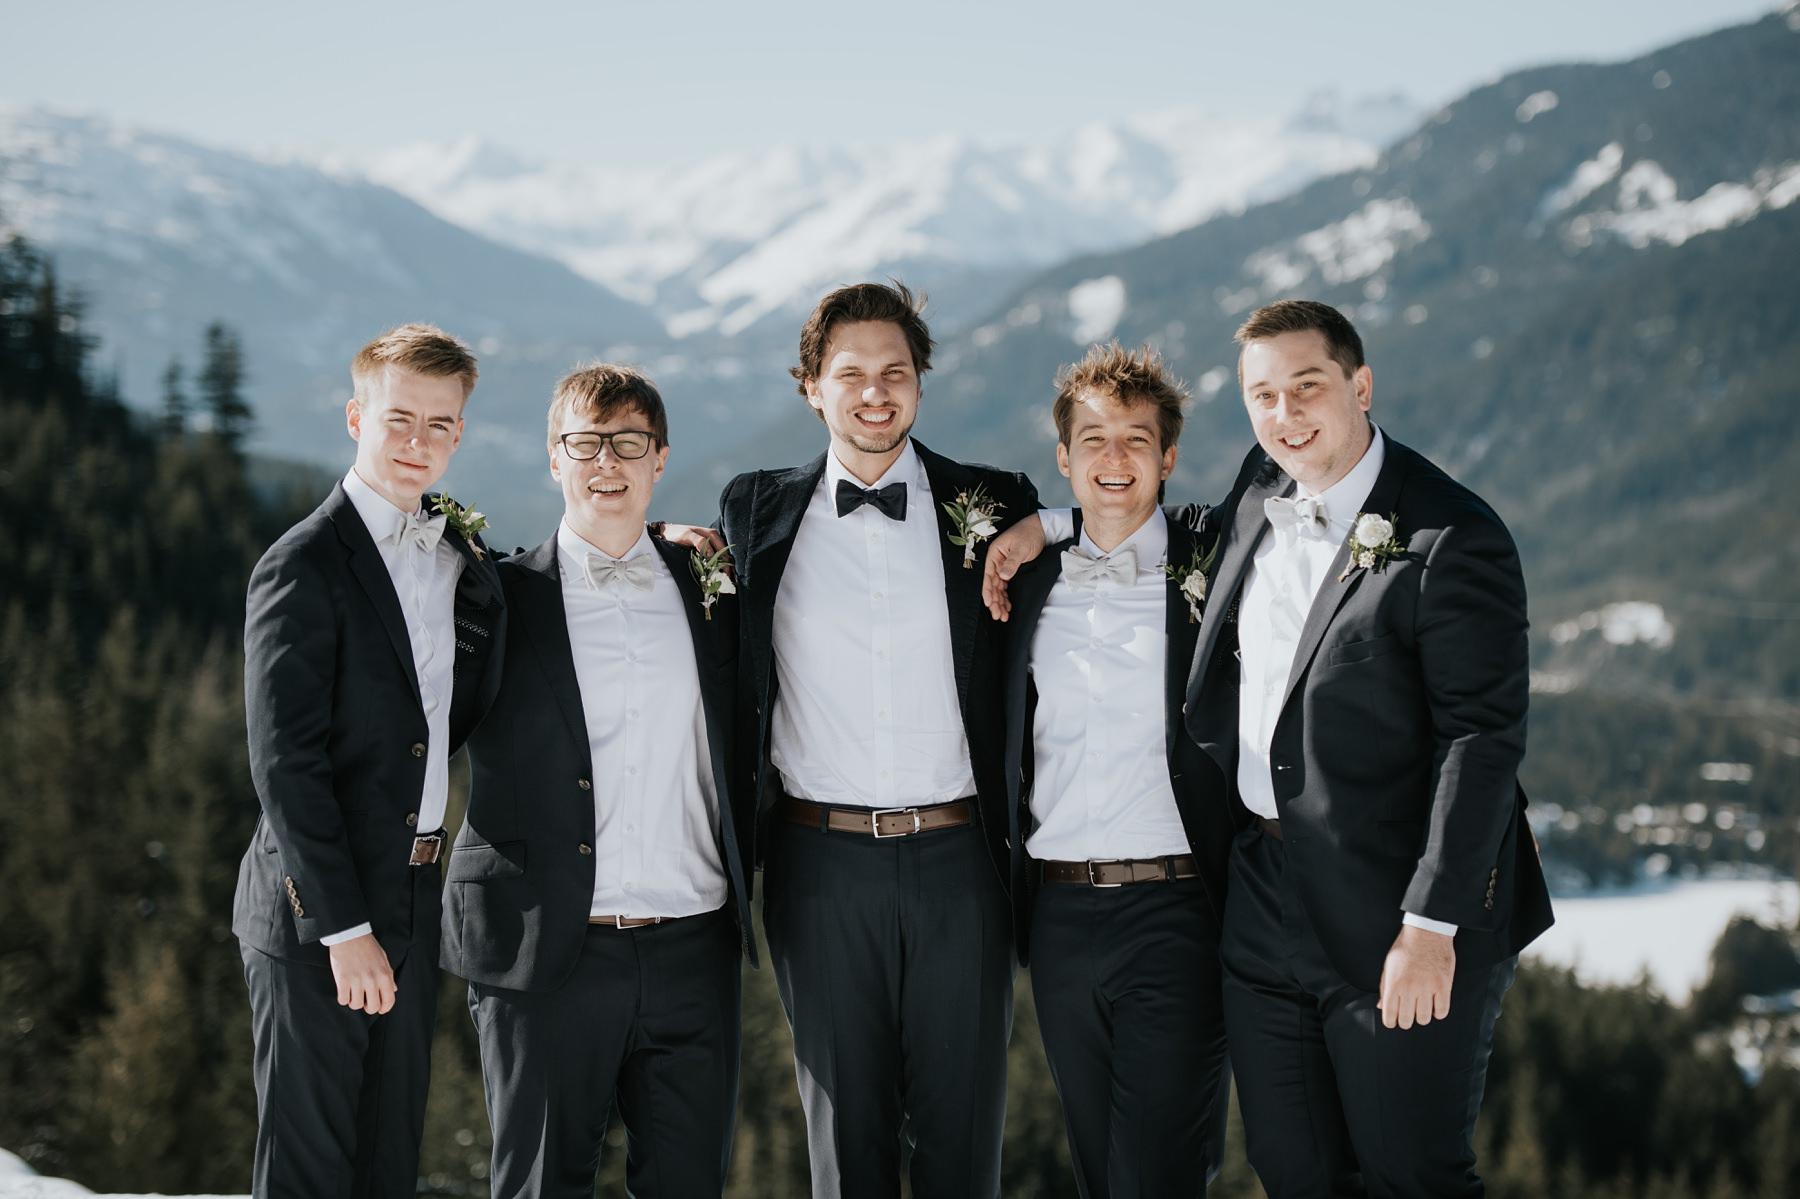 groom and groomsmen in mountain wedding